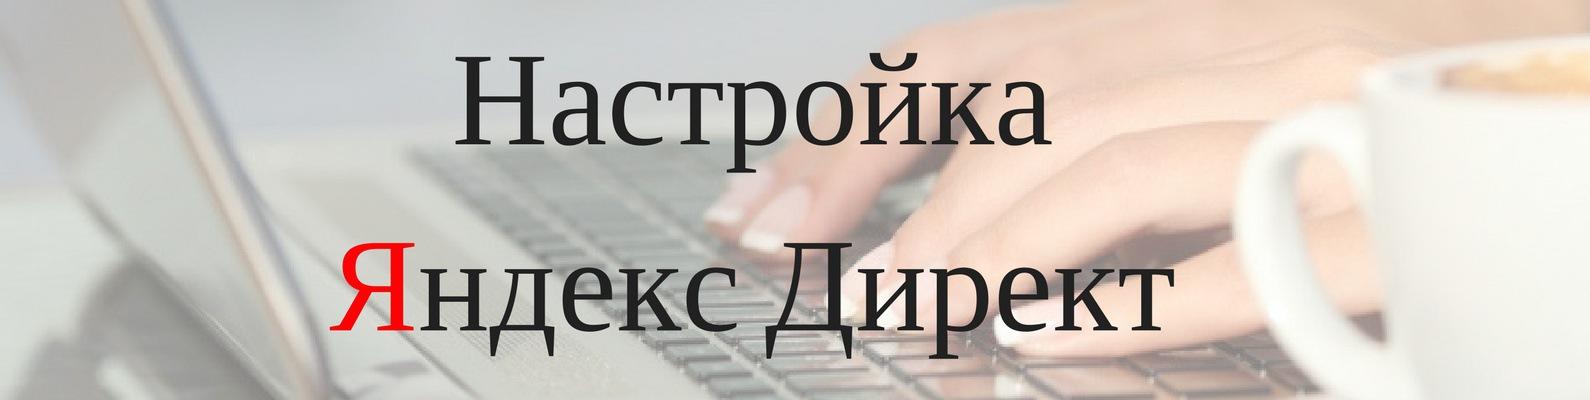 Настройка Яндекс.Директ в Москве